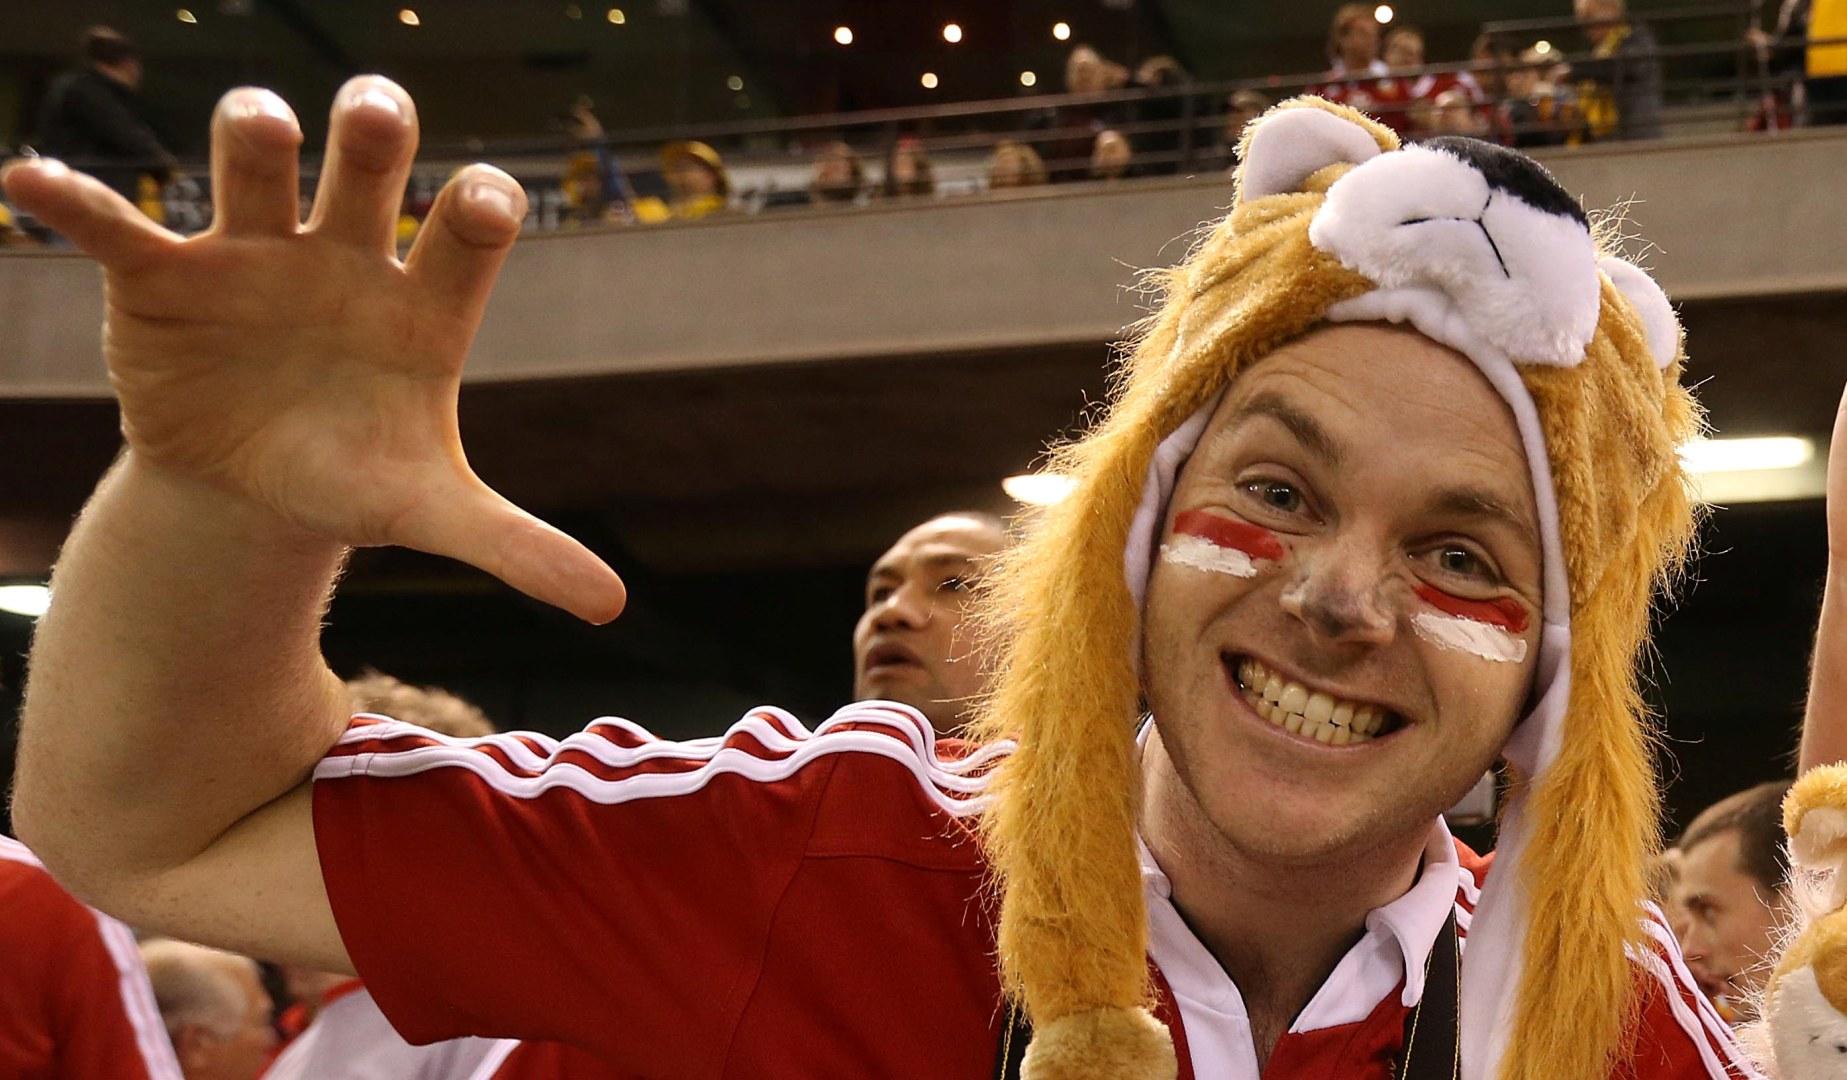 Auckland-bound Lions fans won't be short of entertainment